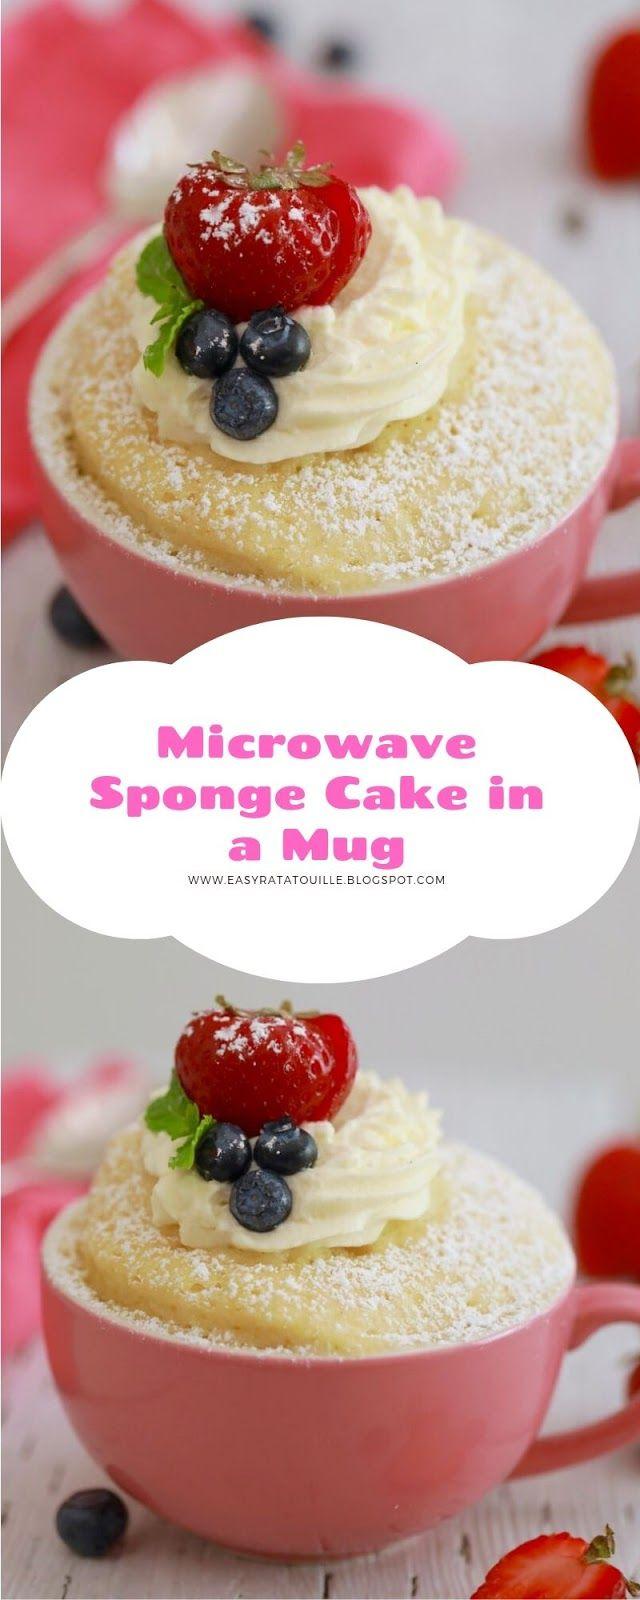 Microwave Sponge Cake in a Mug | Microwave sponge cake ...